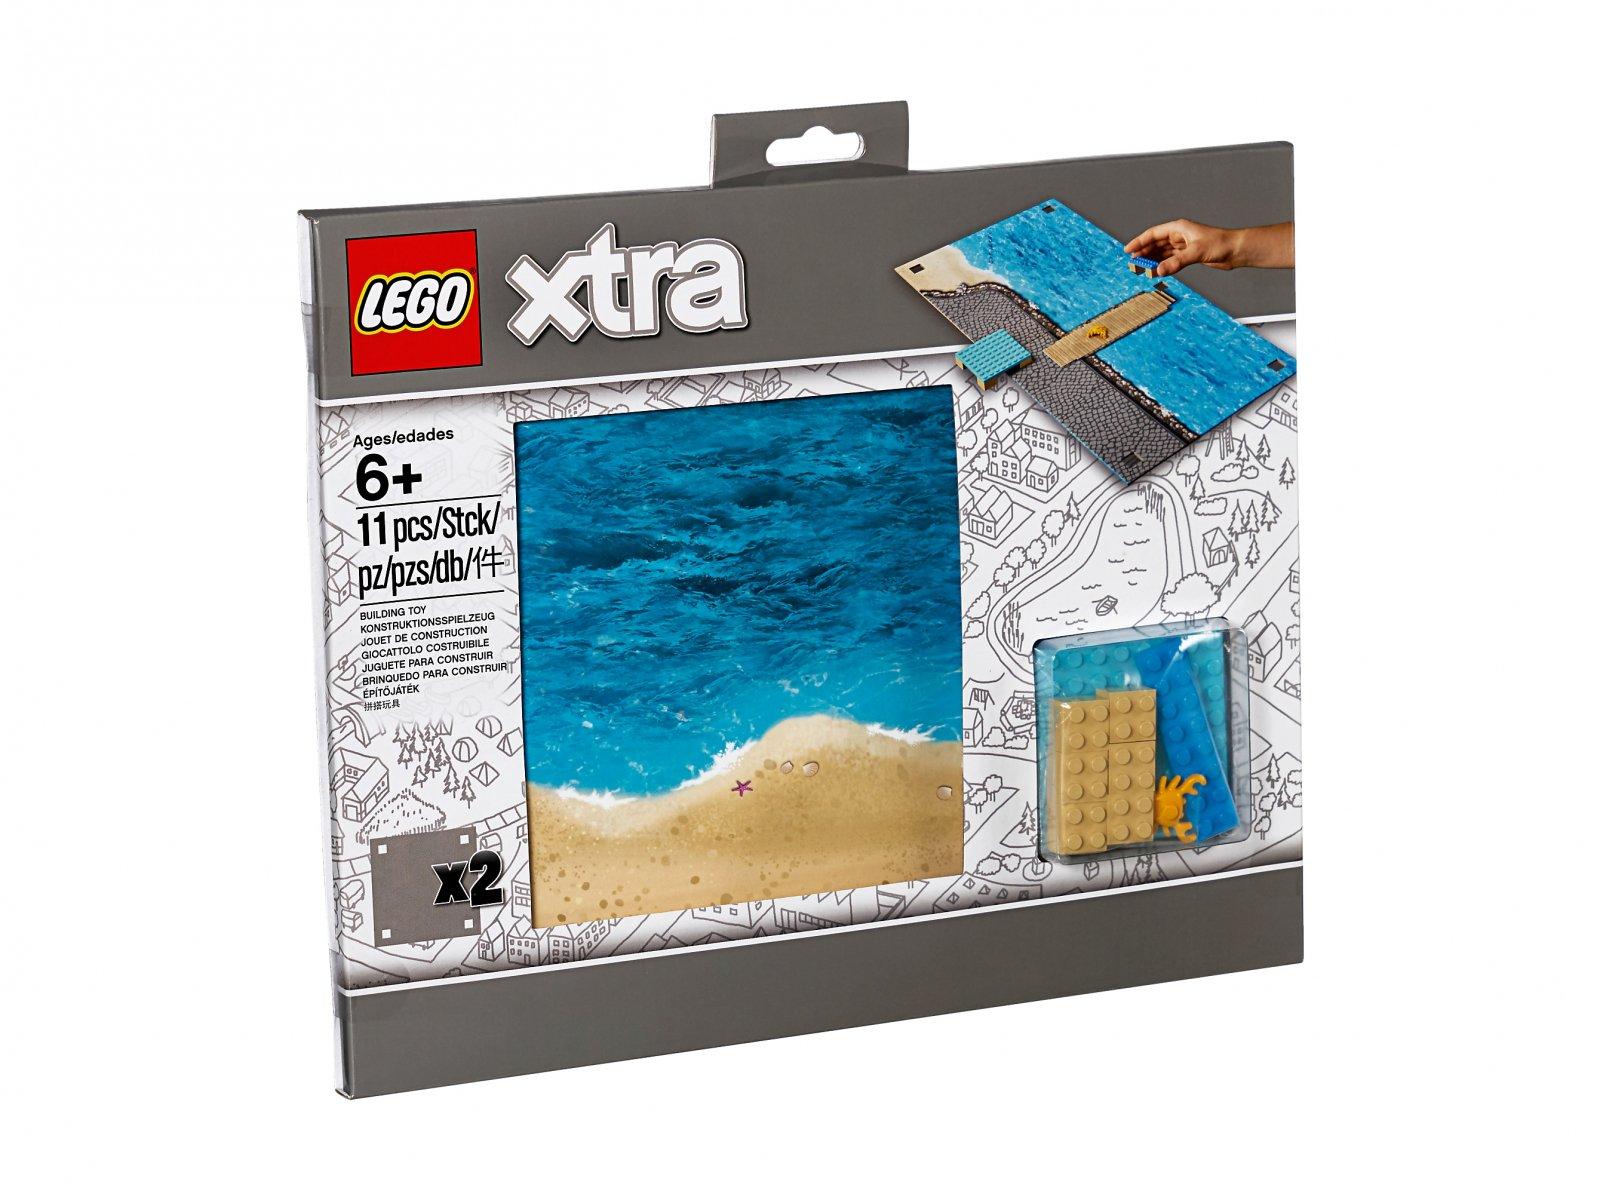 LEGO xtra Morska plansza